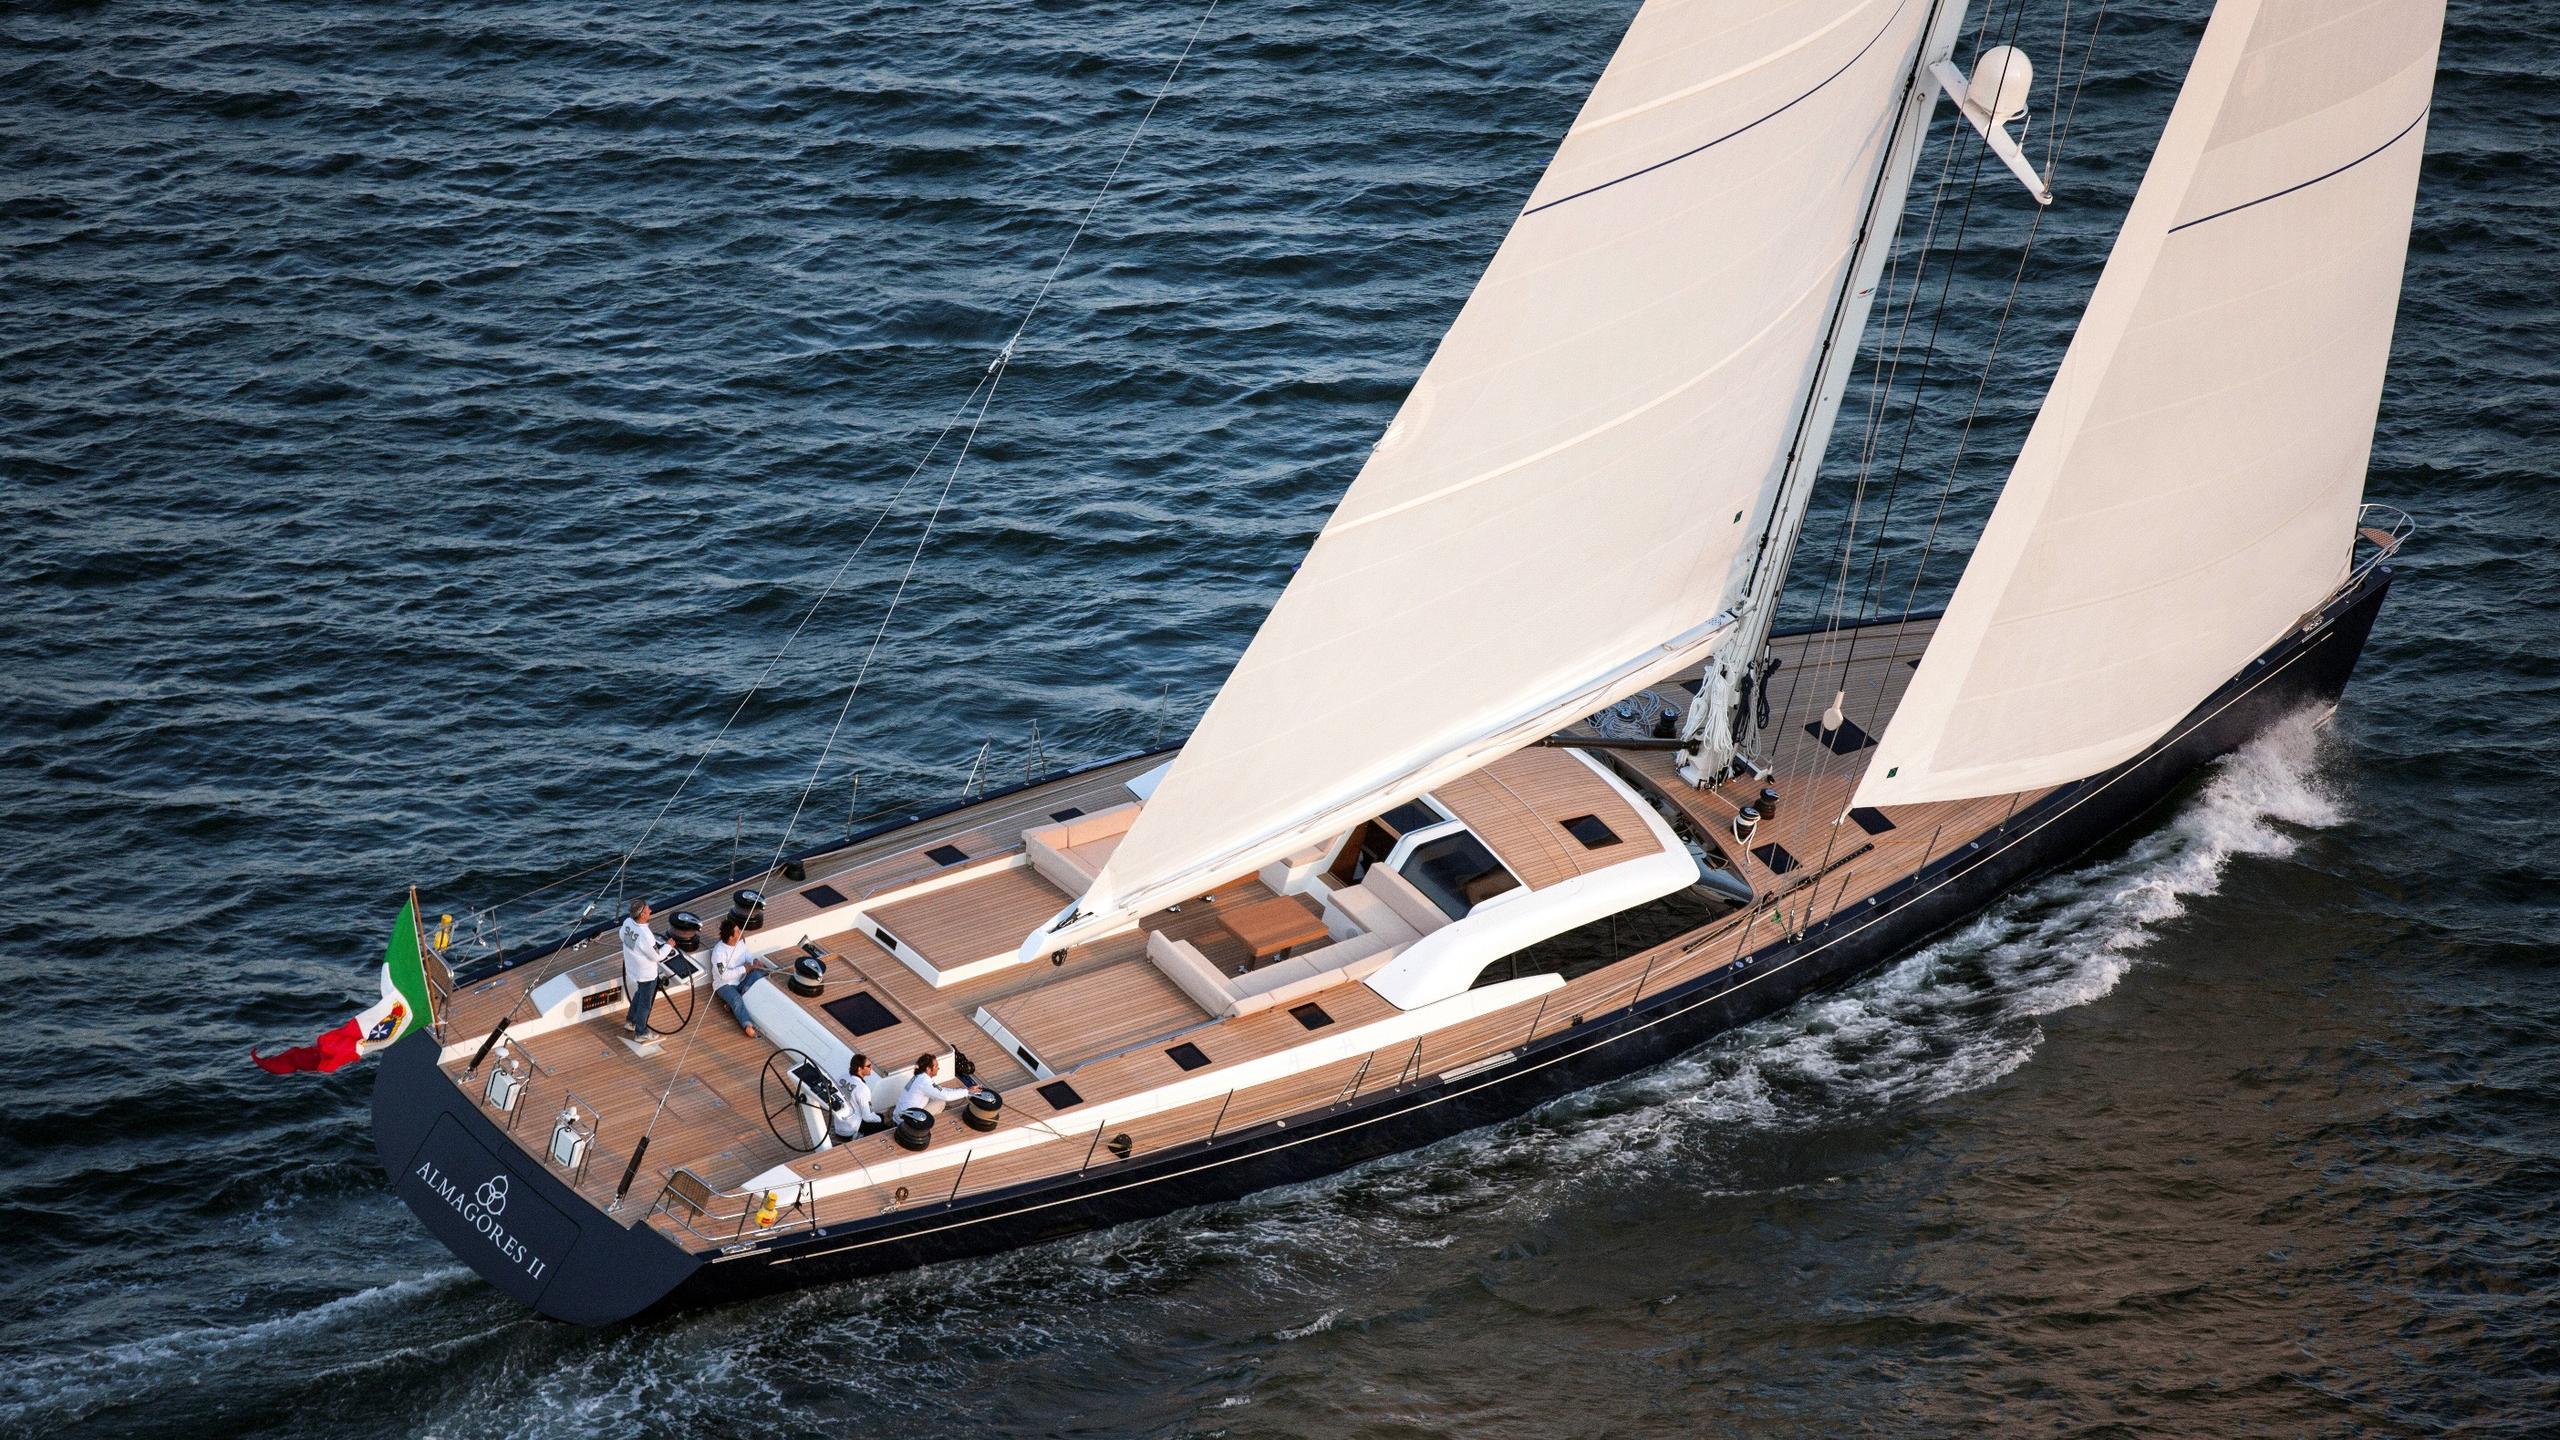 Almagores II sailing yacht running aft